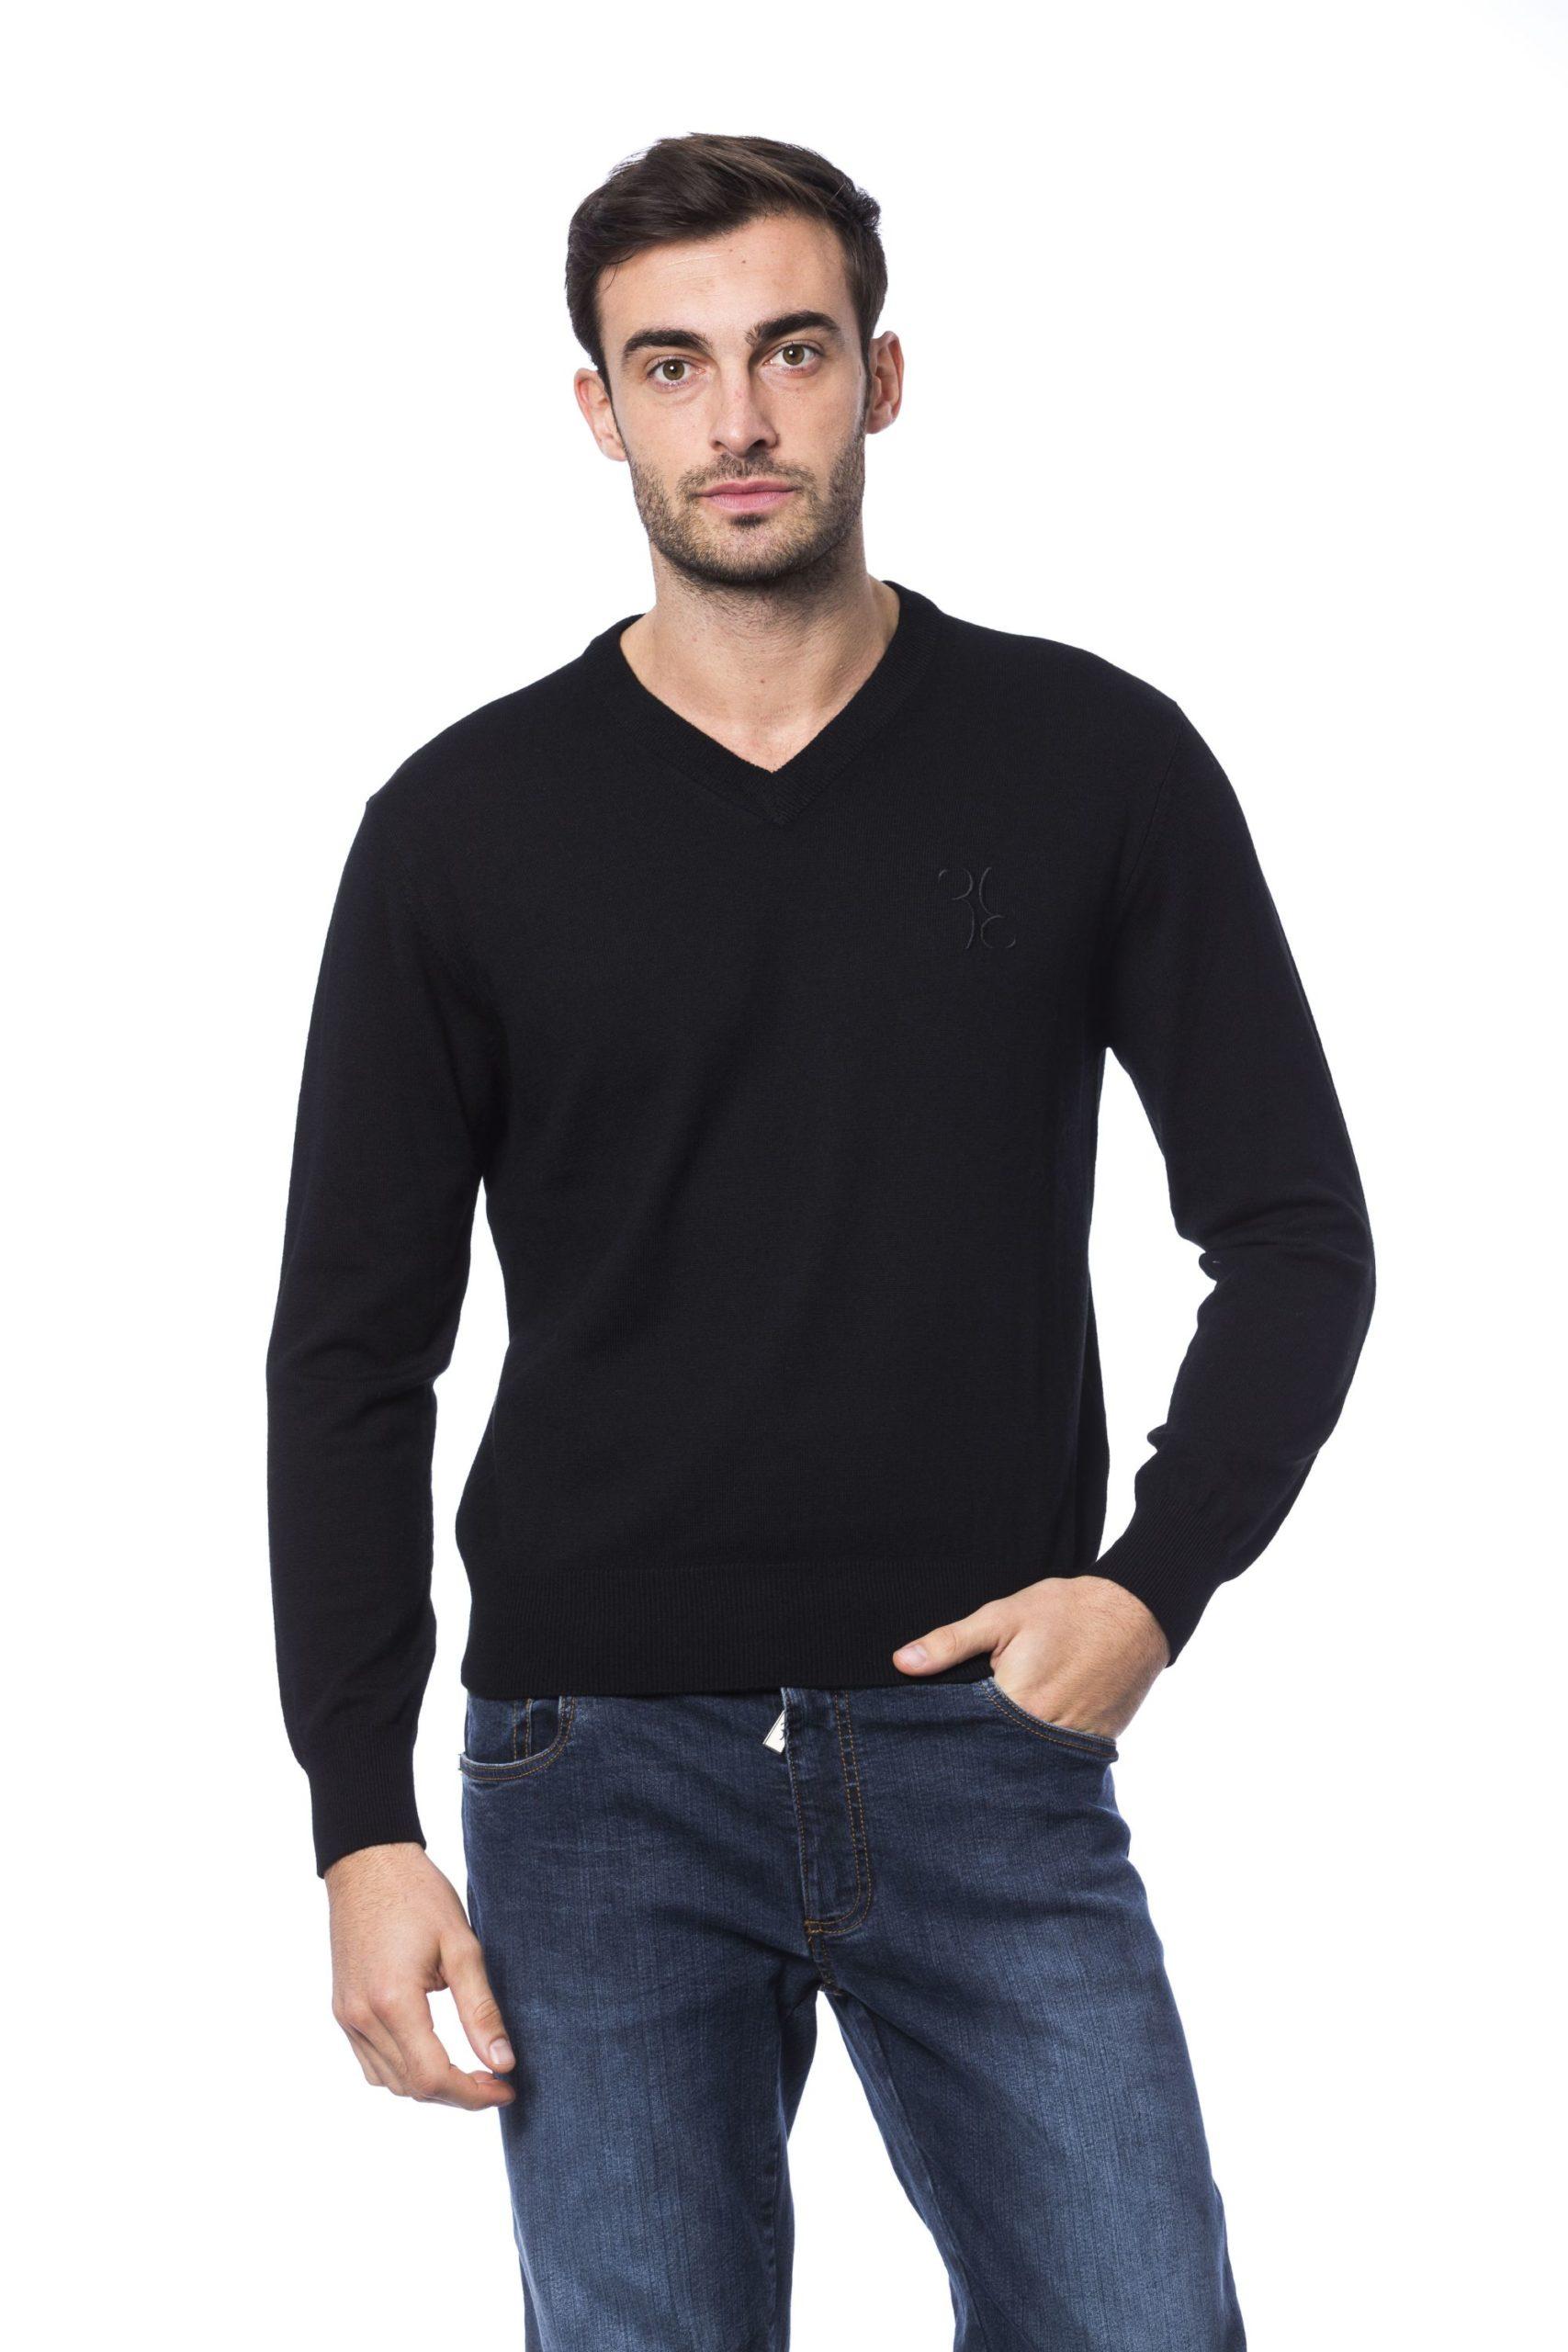 Billionaire Italian Couture Men's Nero Sweater Black BI1271983 - S